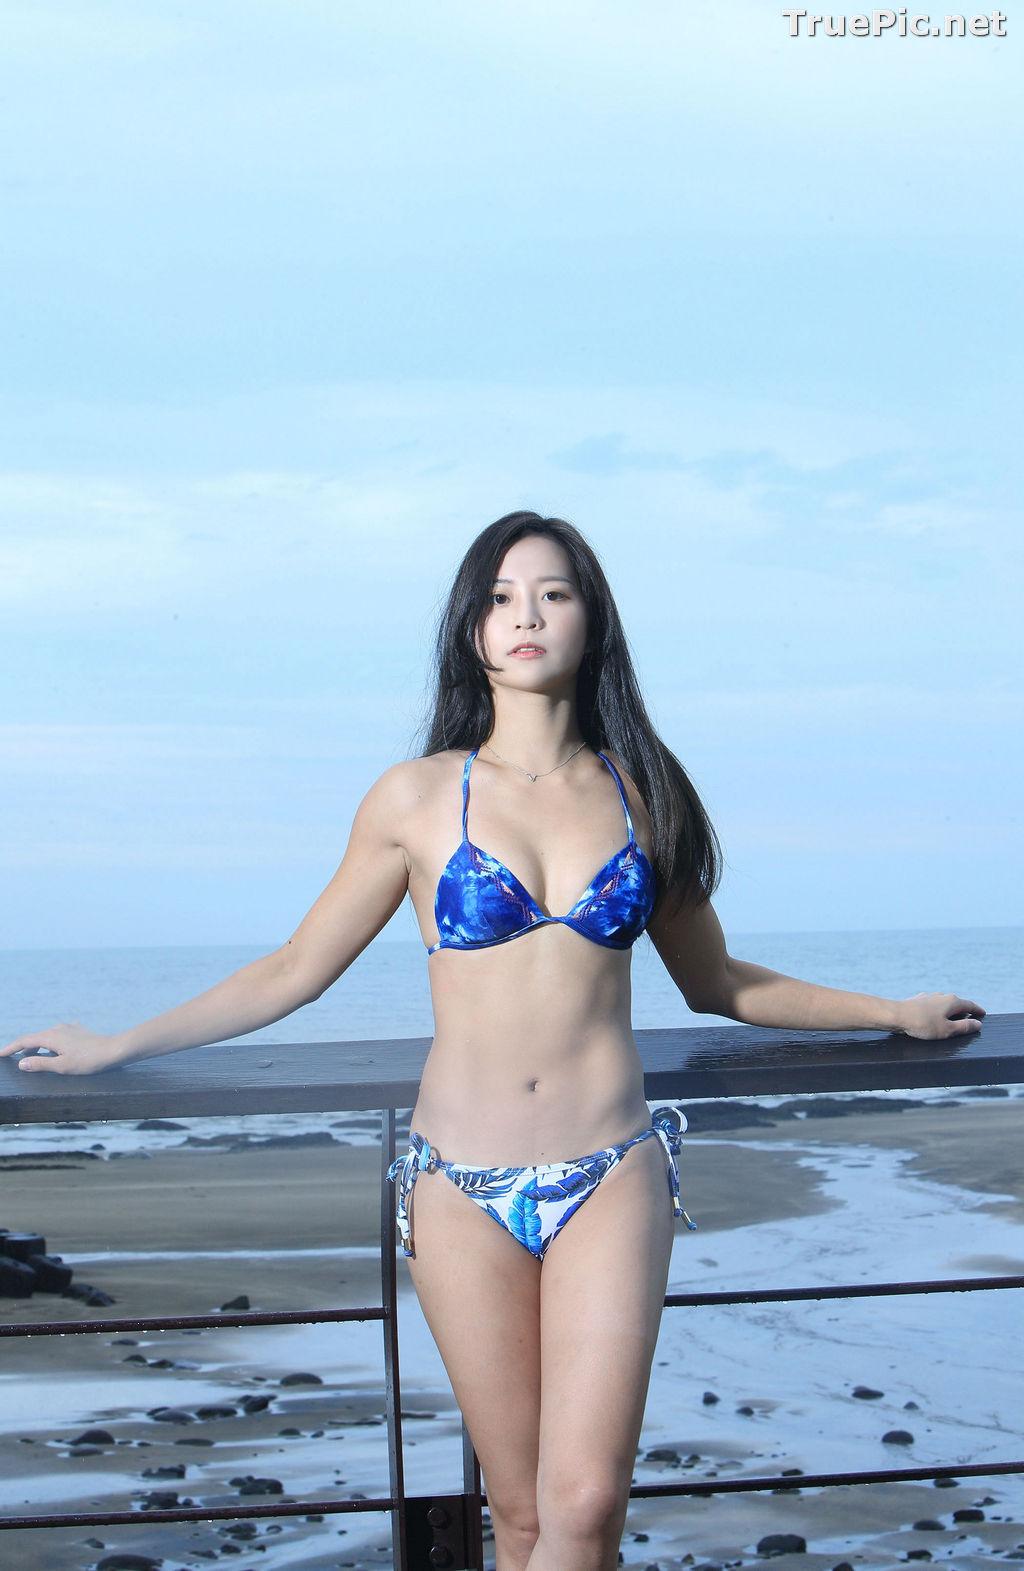 Image Taiwanese Model - Shelly - Beautiful Bodybuilding Bikini Girl - TruePic.net - Picture-65